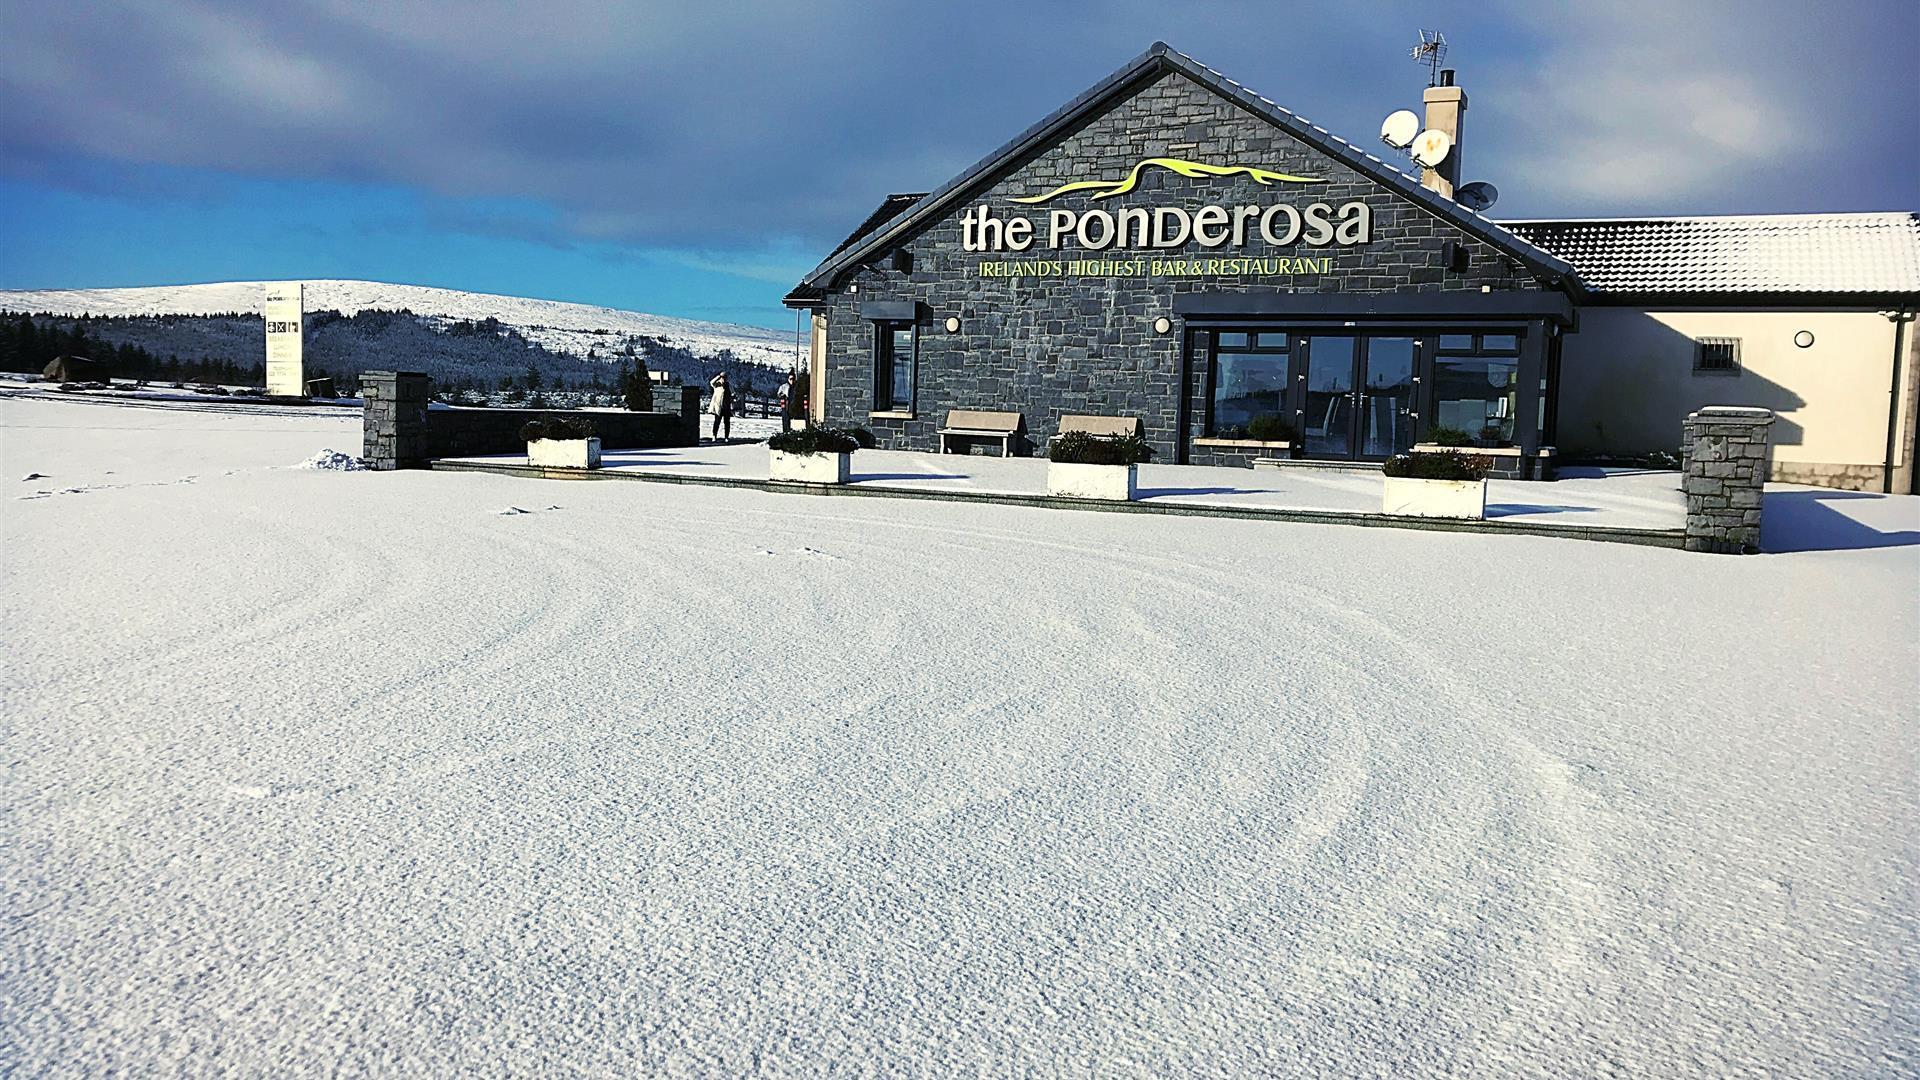 The Ponderosa Bar and Restaurant